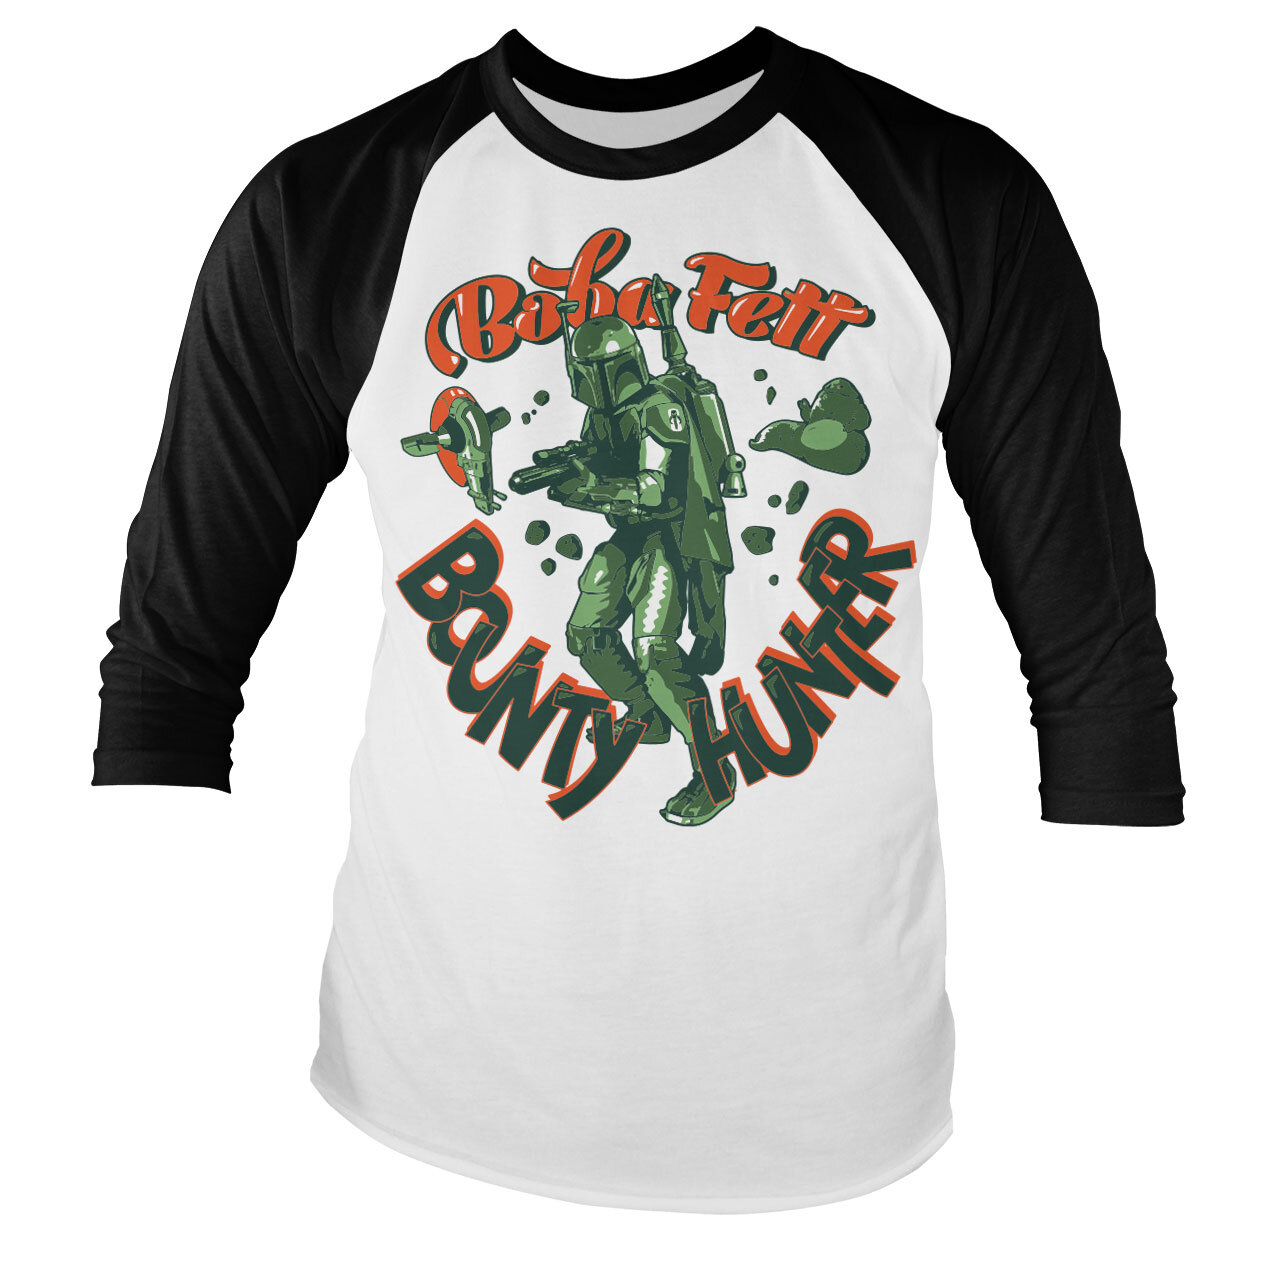 Star Wars - Boba Fett Baseball Long Sleeve Tee